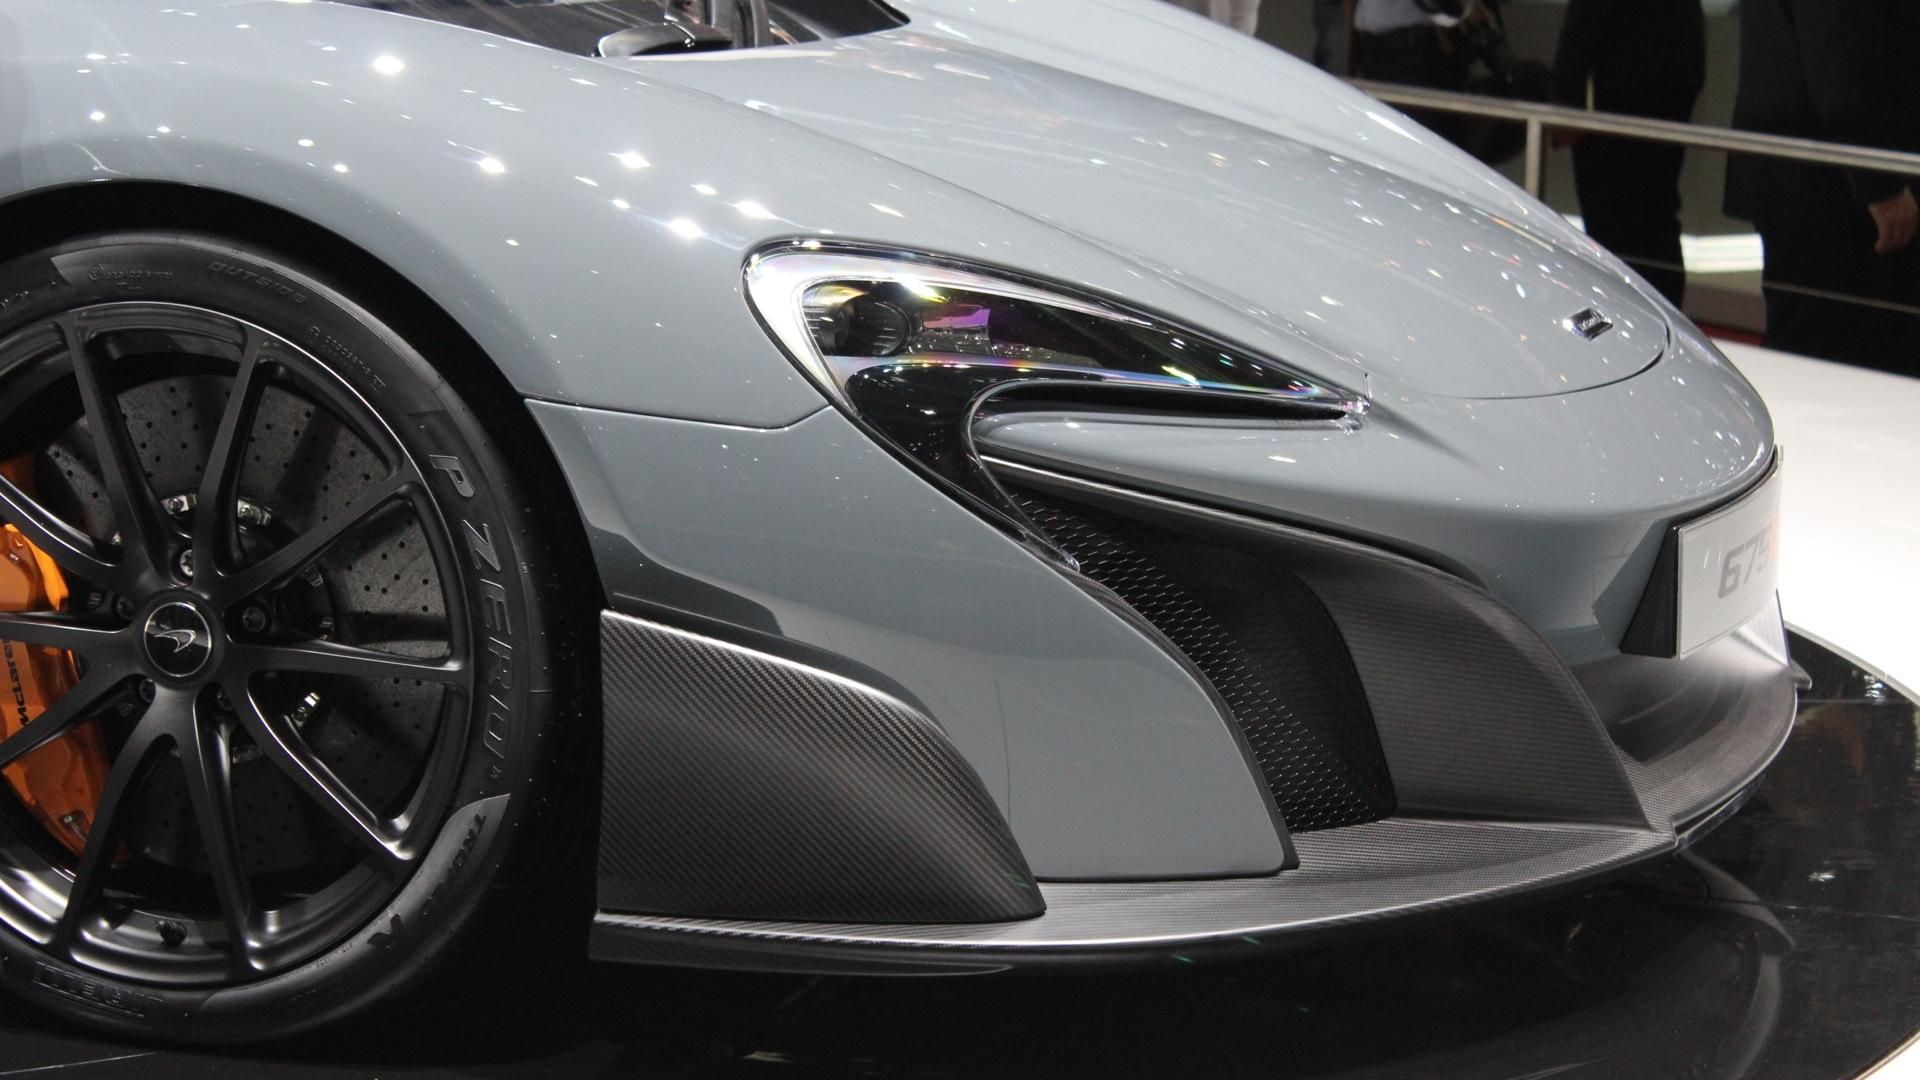 2016 McLaren 675LT  -  2015 Geneva Motor Show live photos